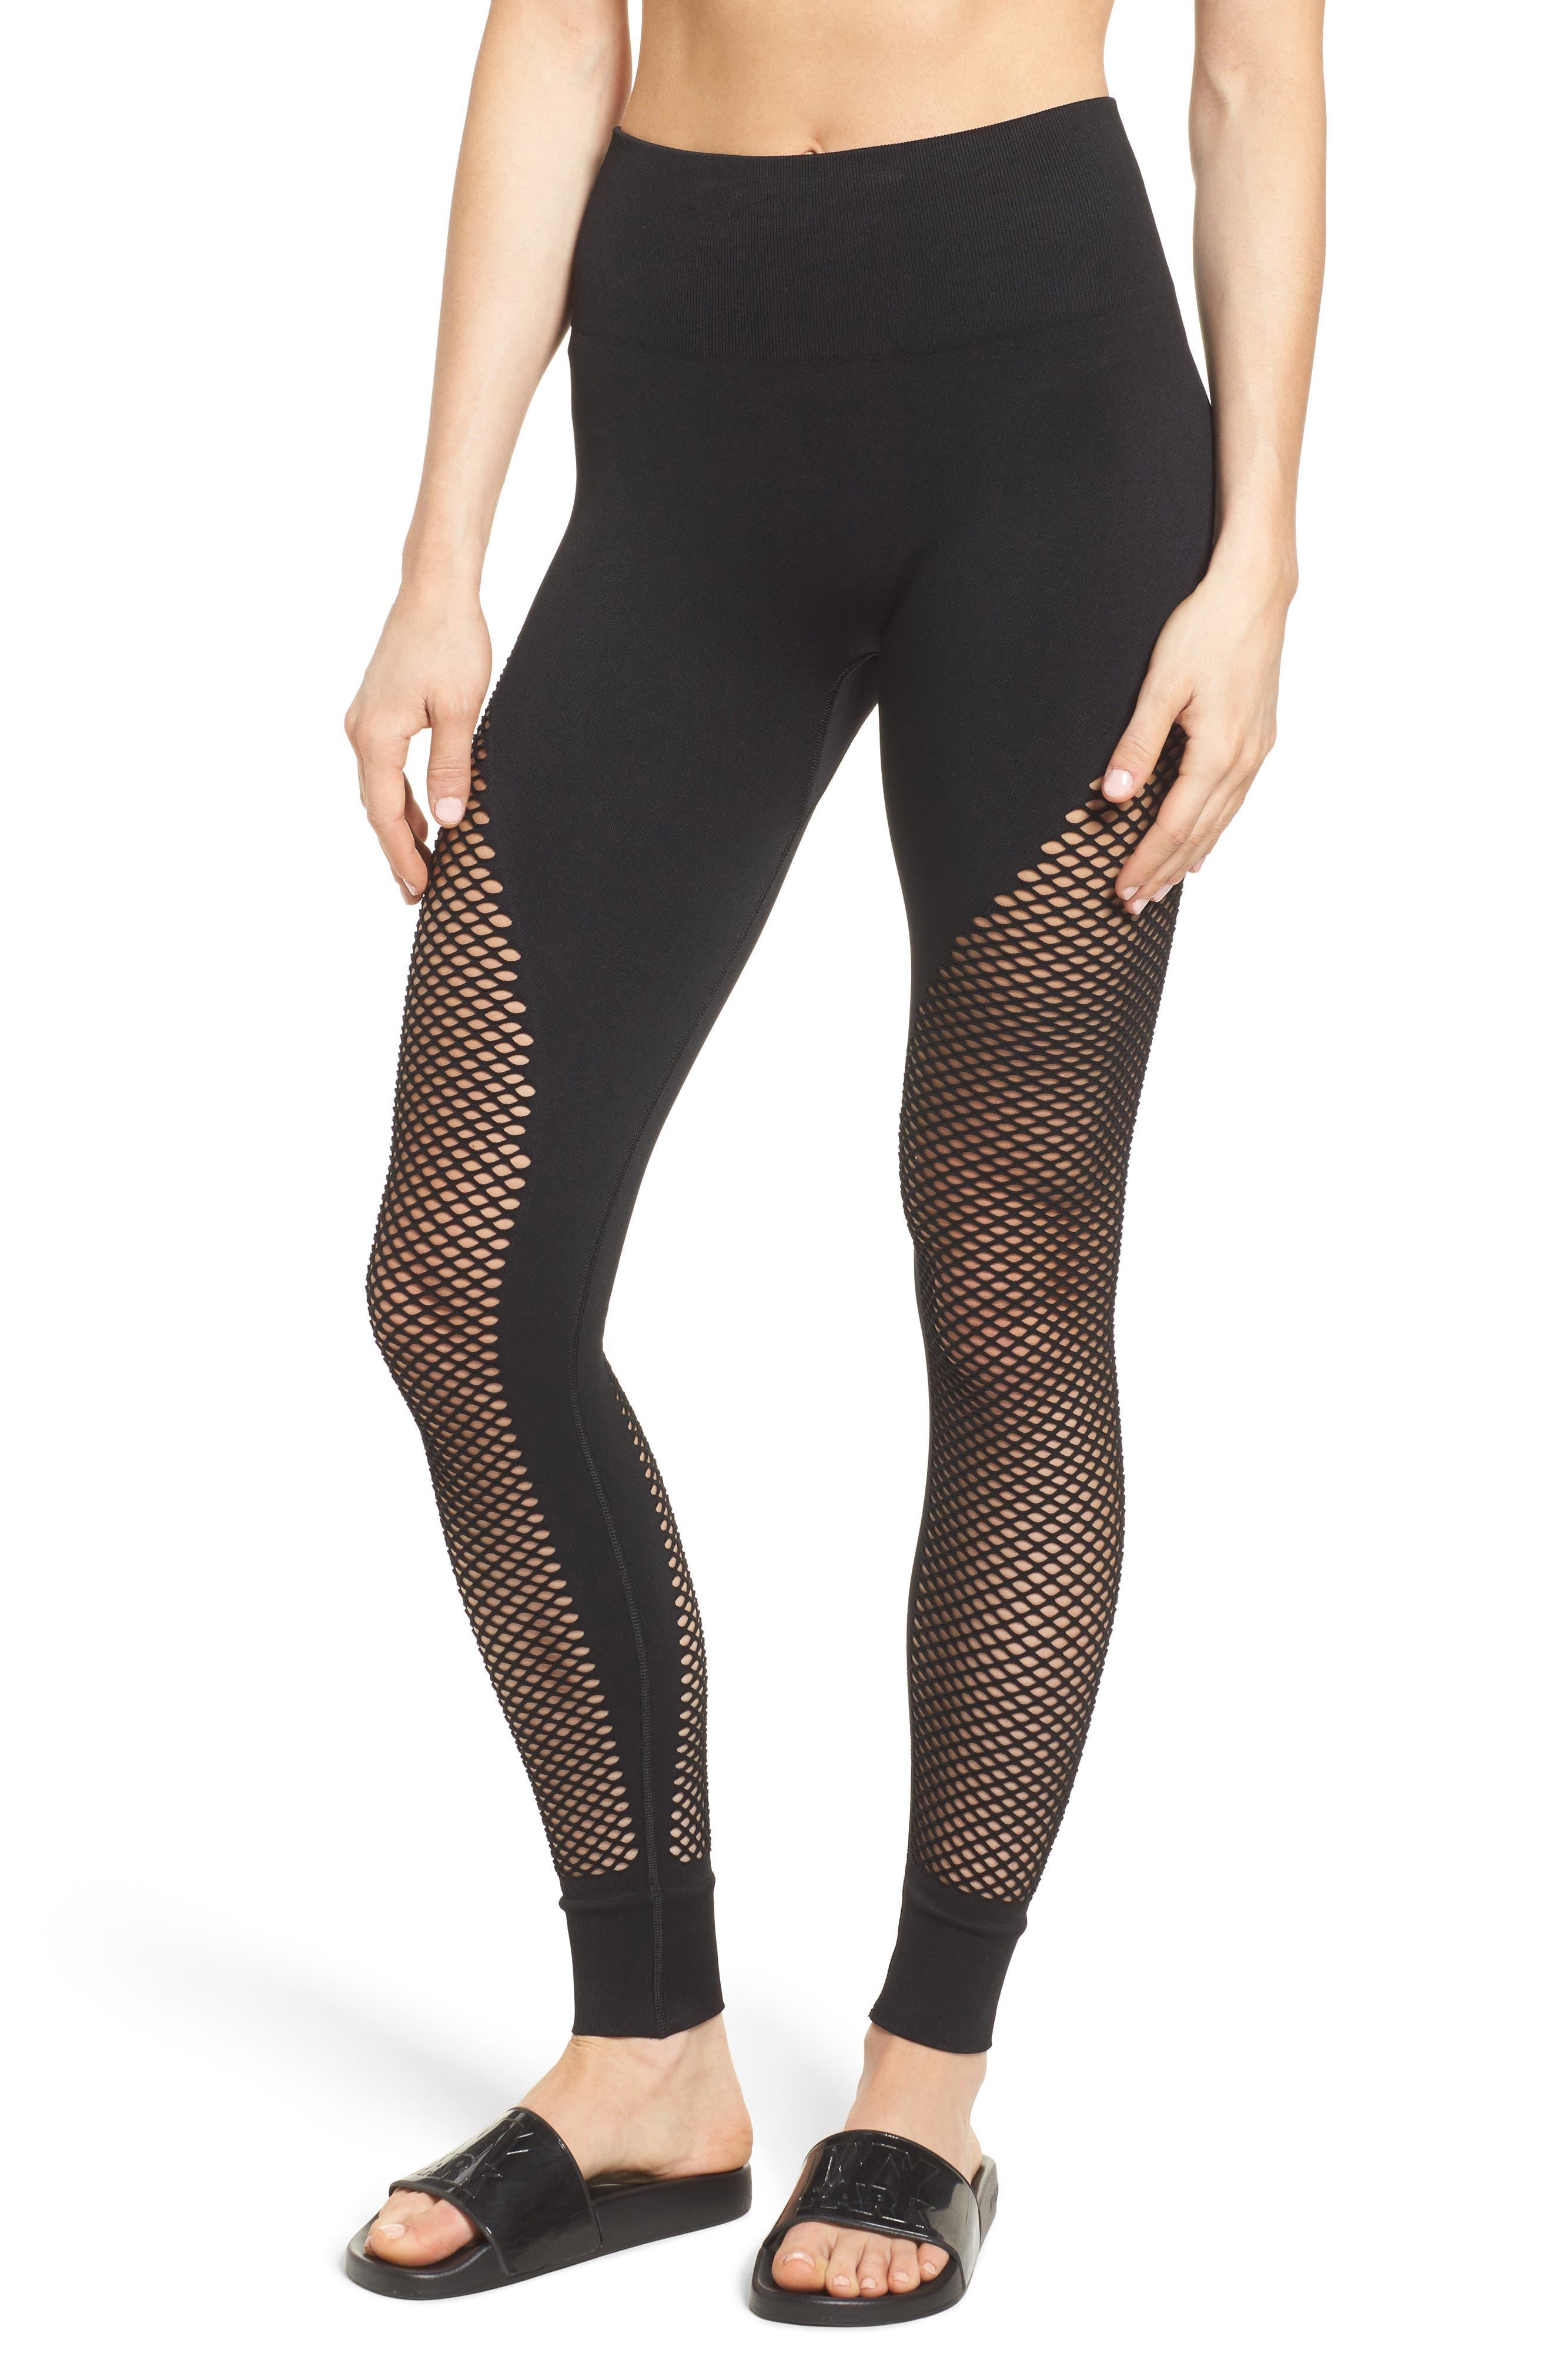 Main Image - IVY PARK® Fishnet Leggings